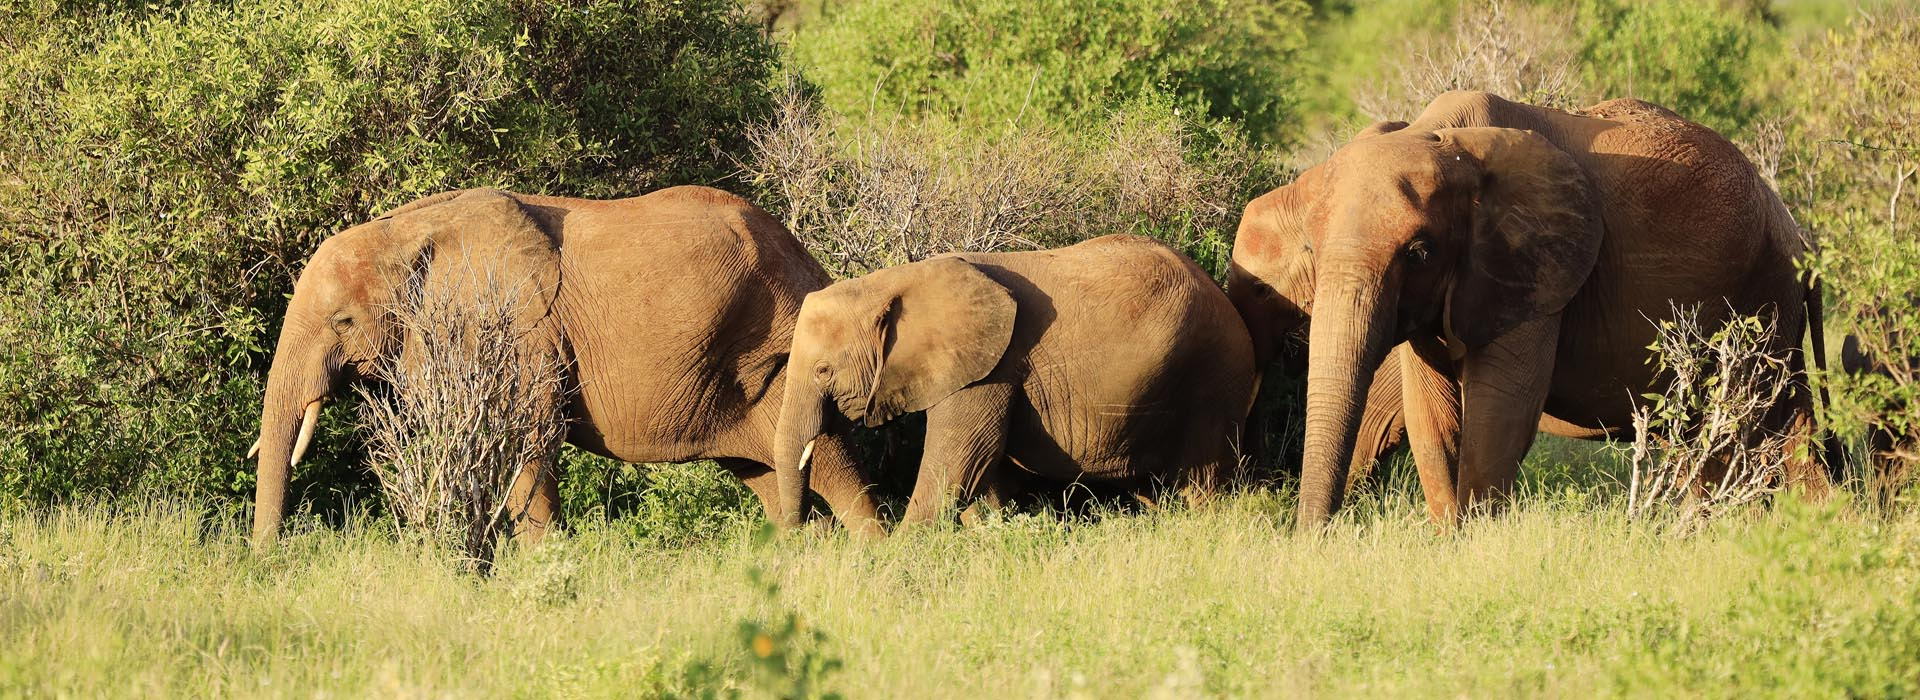 African Adventure Specialists - Tsavo East National Park Destination